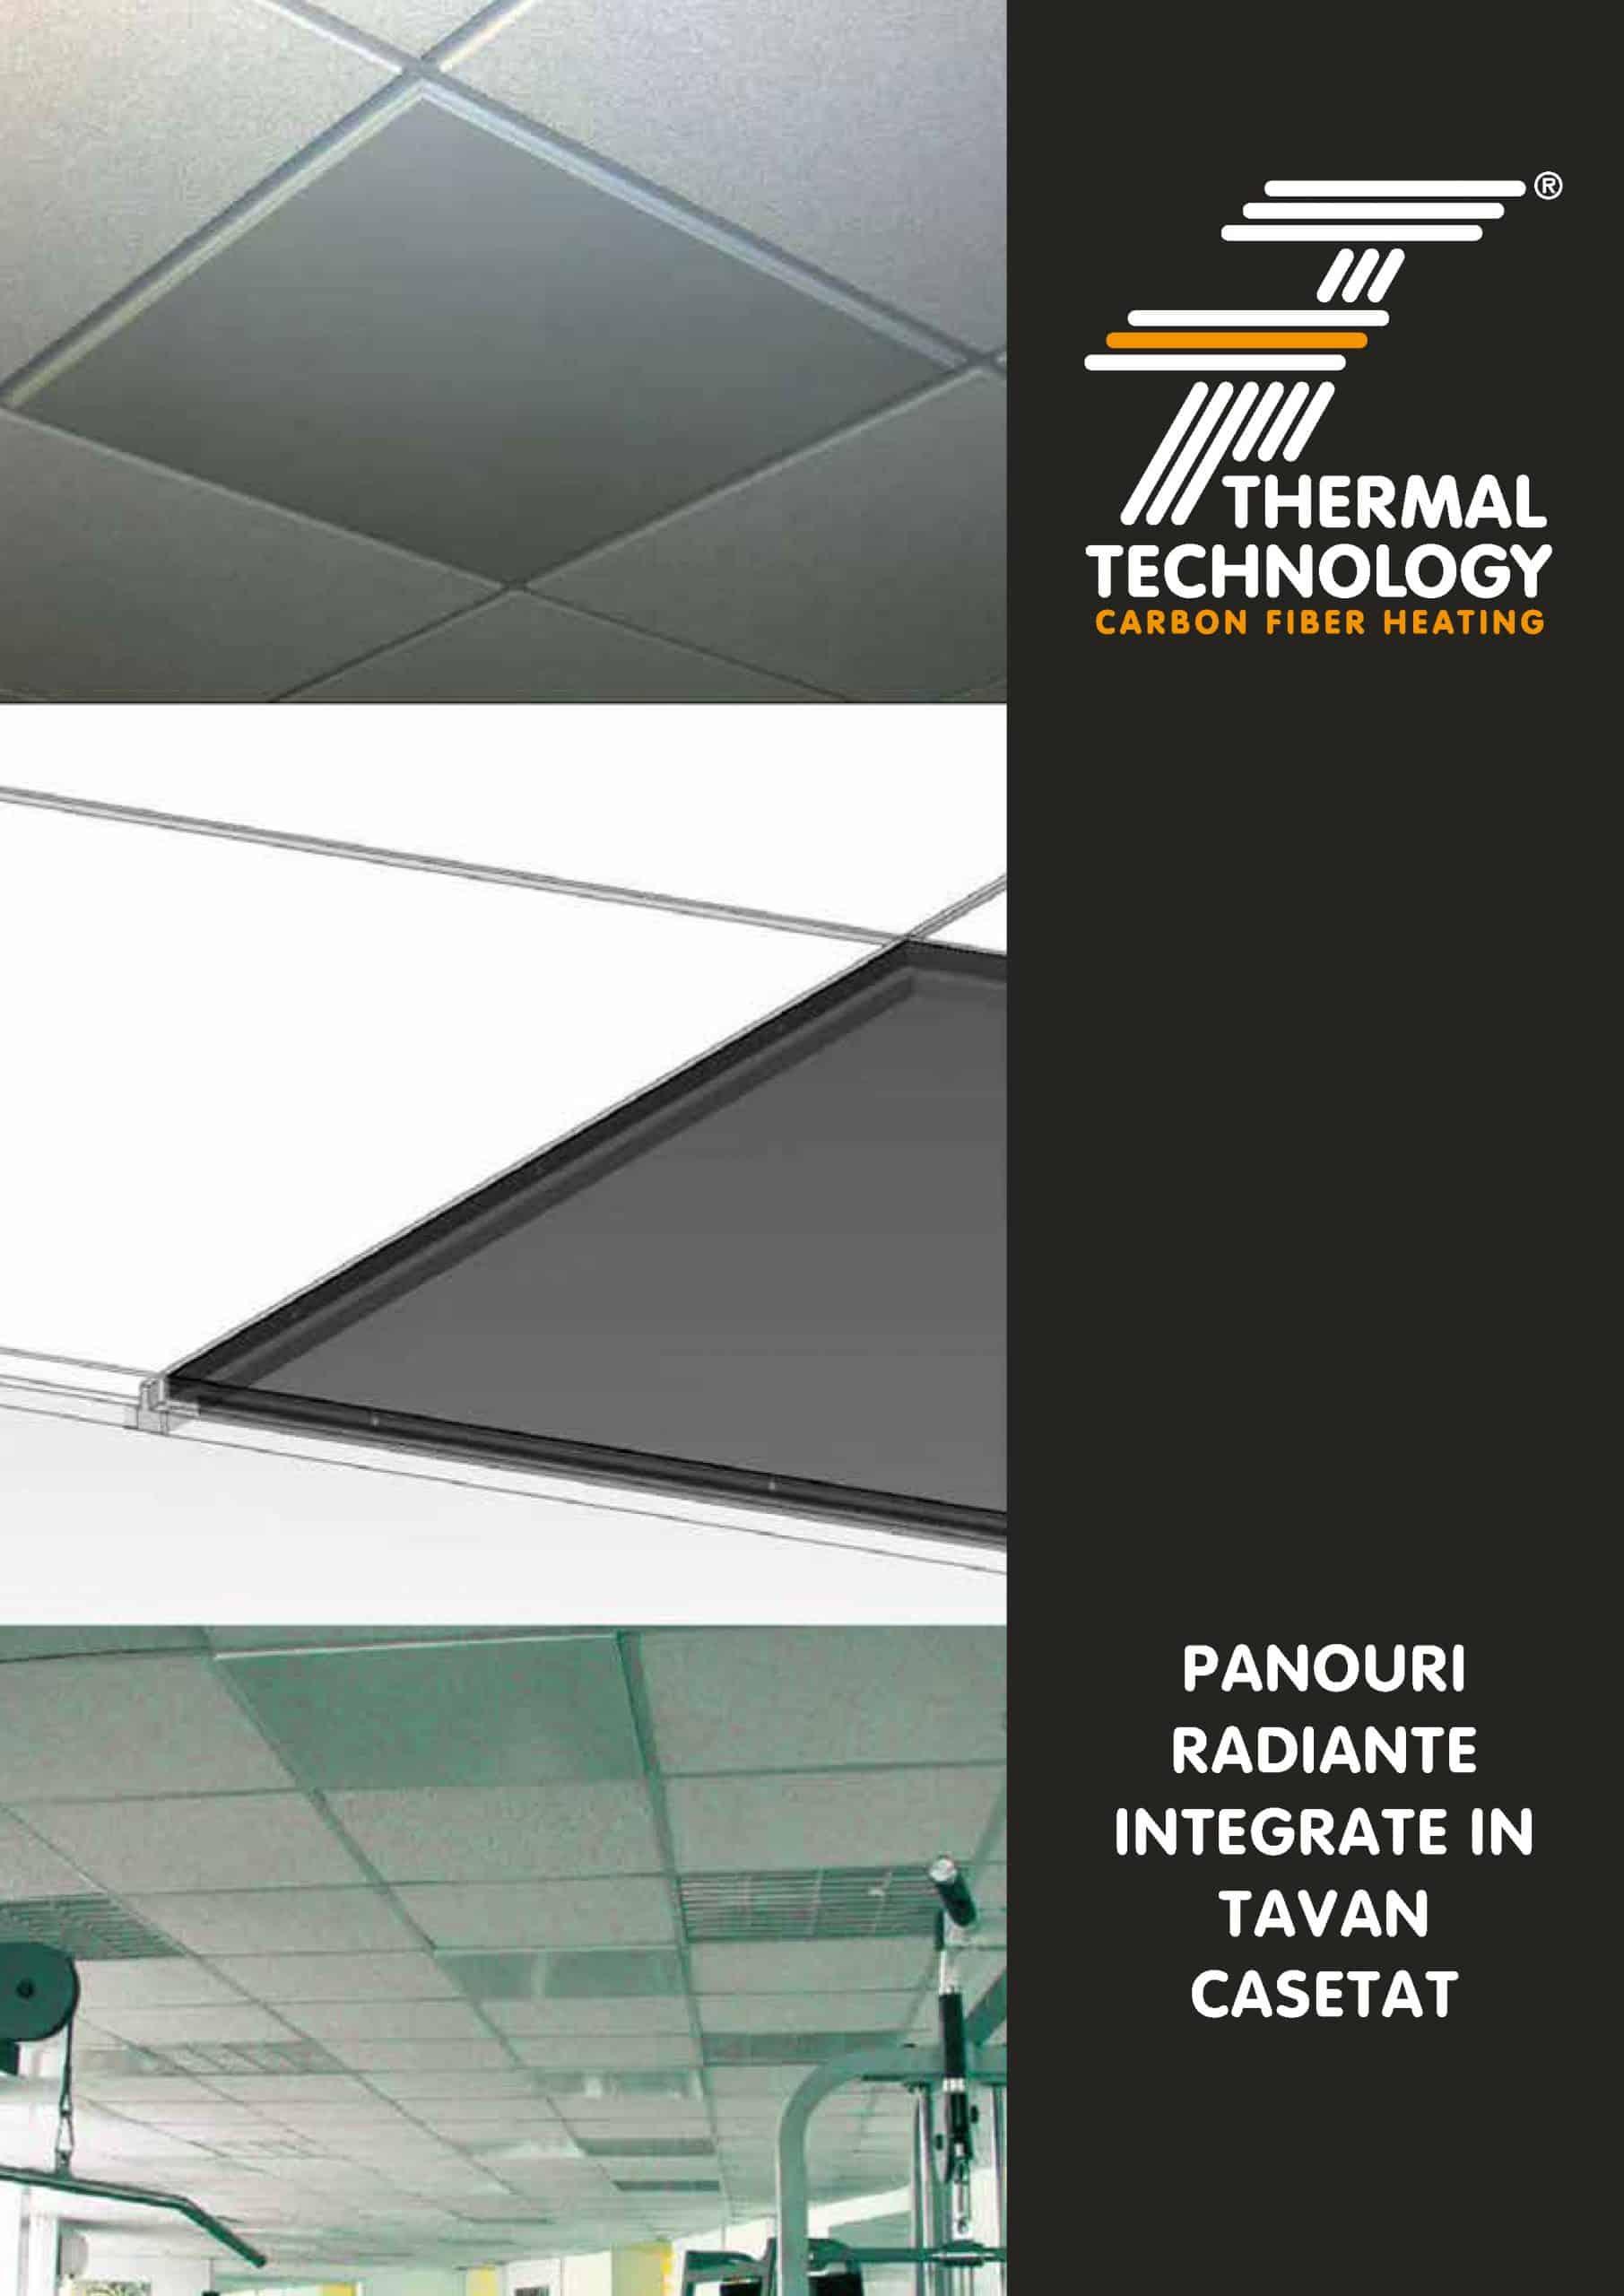 https://thermaltechnology.ro/wp-content/uploads/2020/03/PRS1_RO_Panouri-radiante-integrate-in-Tavan-Casetat_Page_1-scaled.jpg